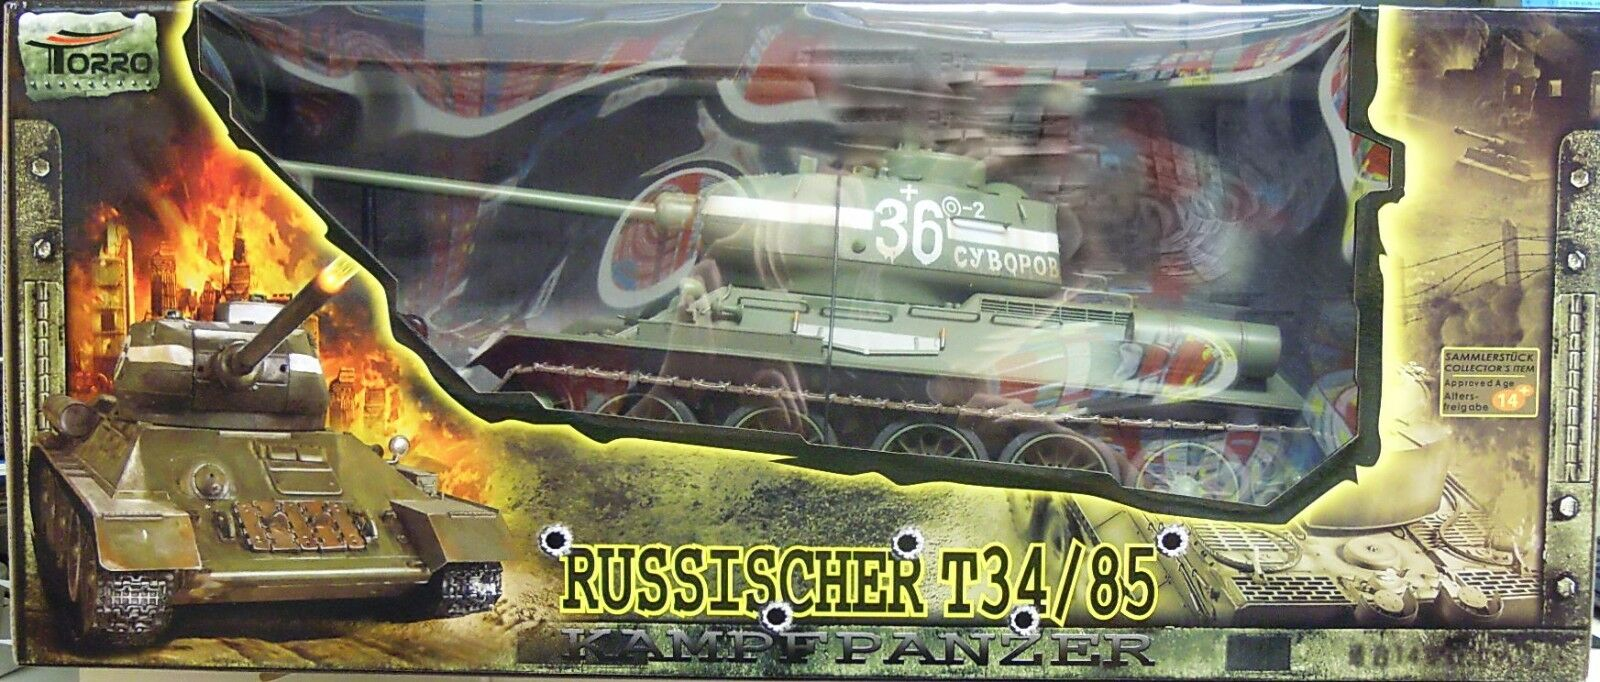 RC modelo t-34, infarojo Sistema de combate, luz   sonido, TORRO , 1 16 , 2,4Ghz